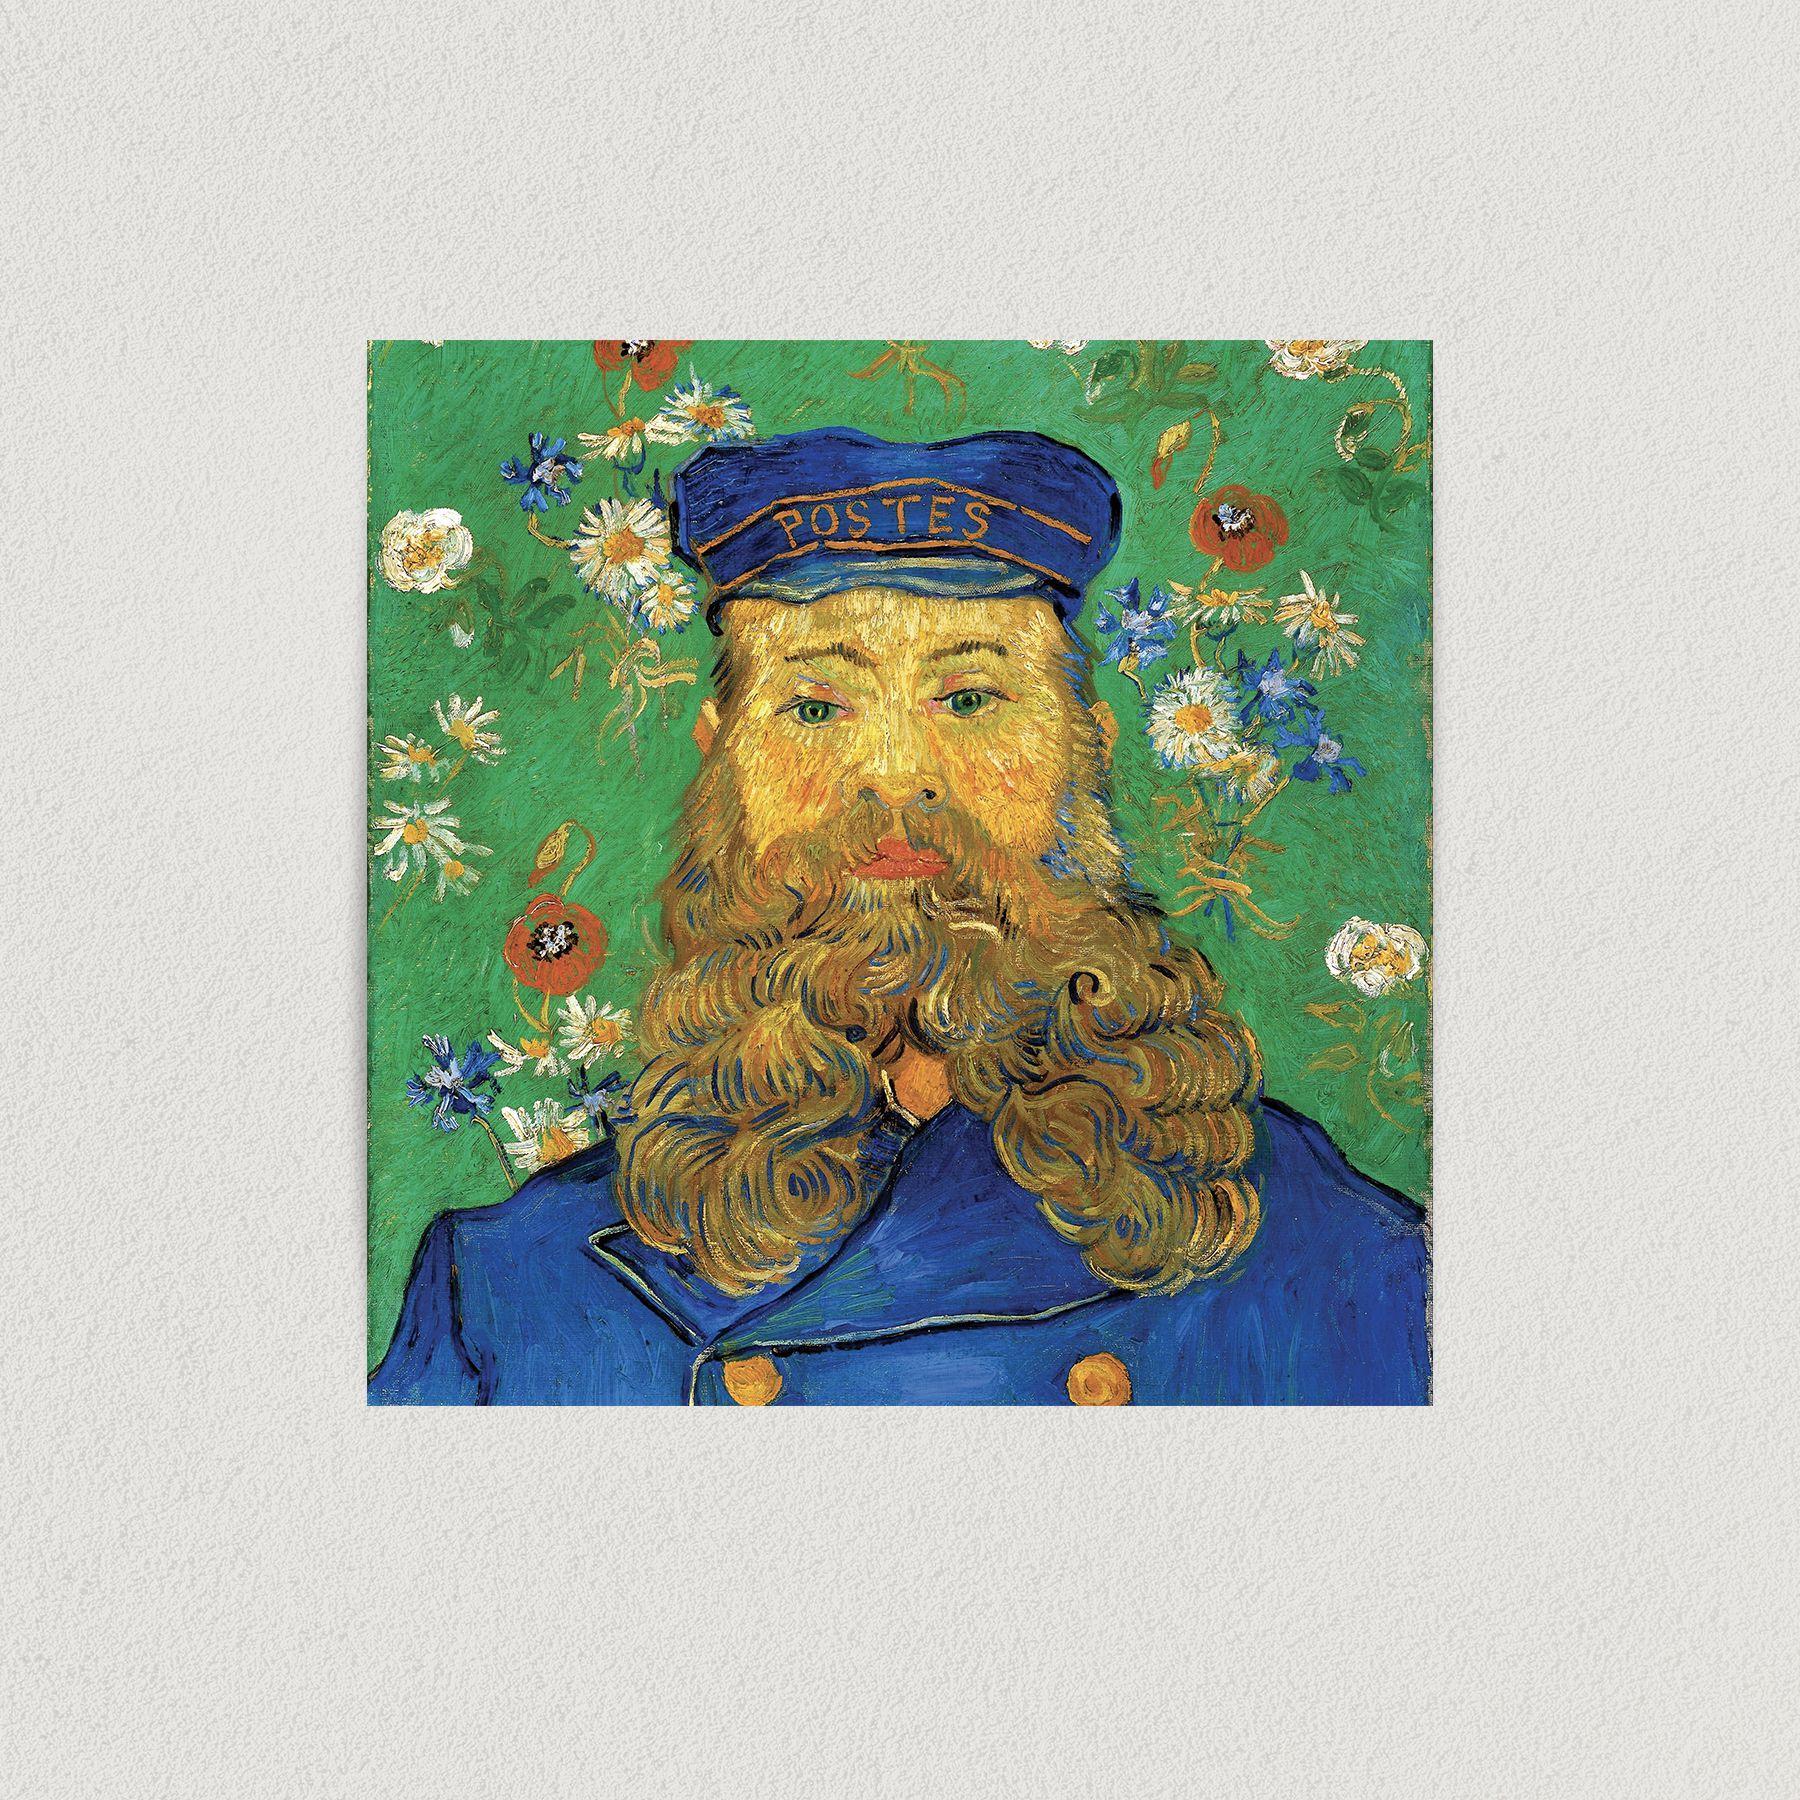 Van Gogh Portrait of Postman Joseph Roulin 1889 Art Print Poster 12″ X 12″ Wall Art VH1010